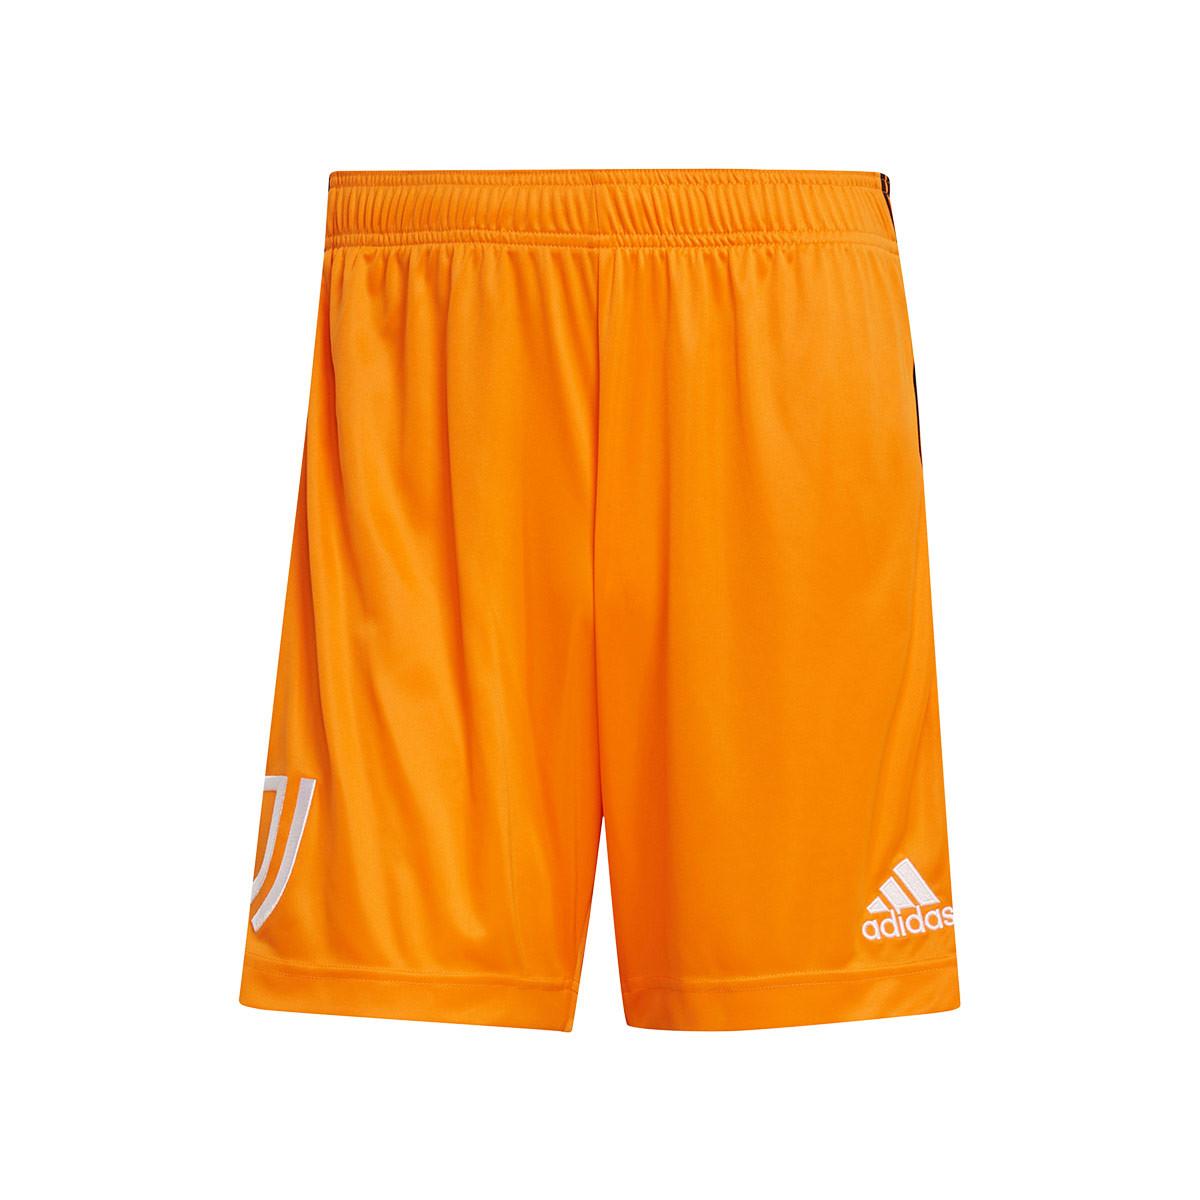 shorts adidas juventus 2020 2021 third bahia orange black football store futbol emotion futbol emotion